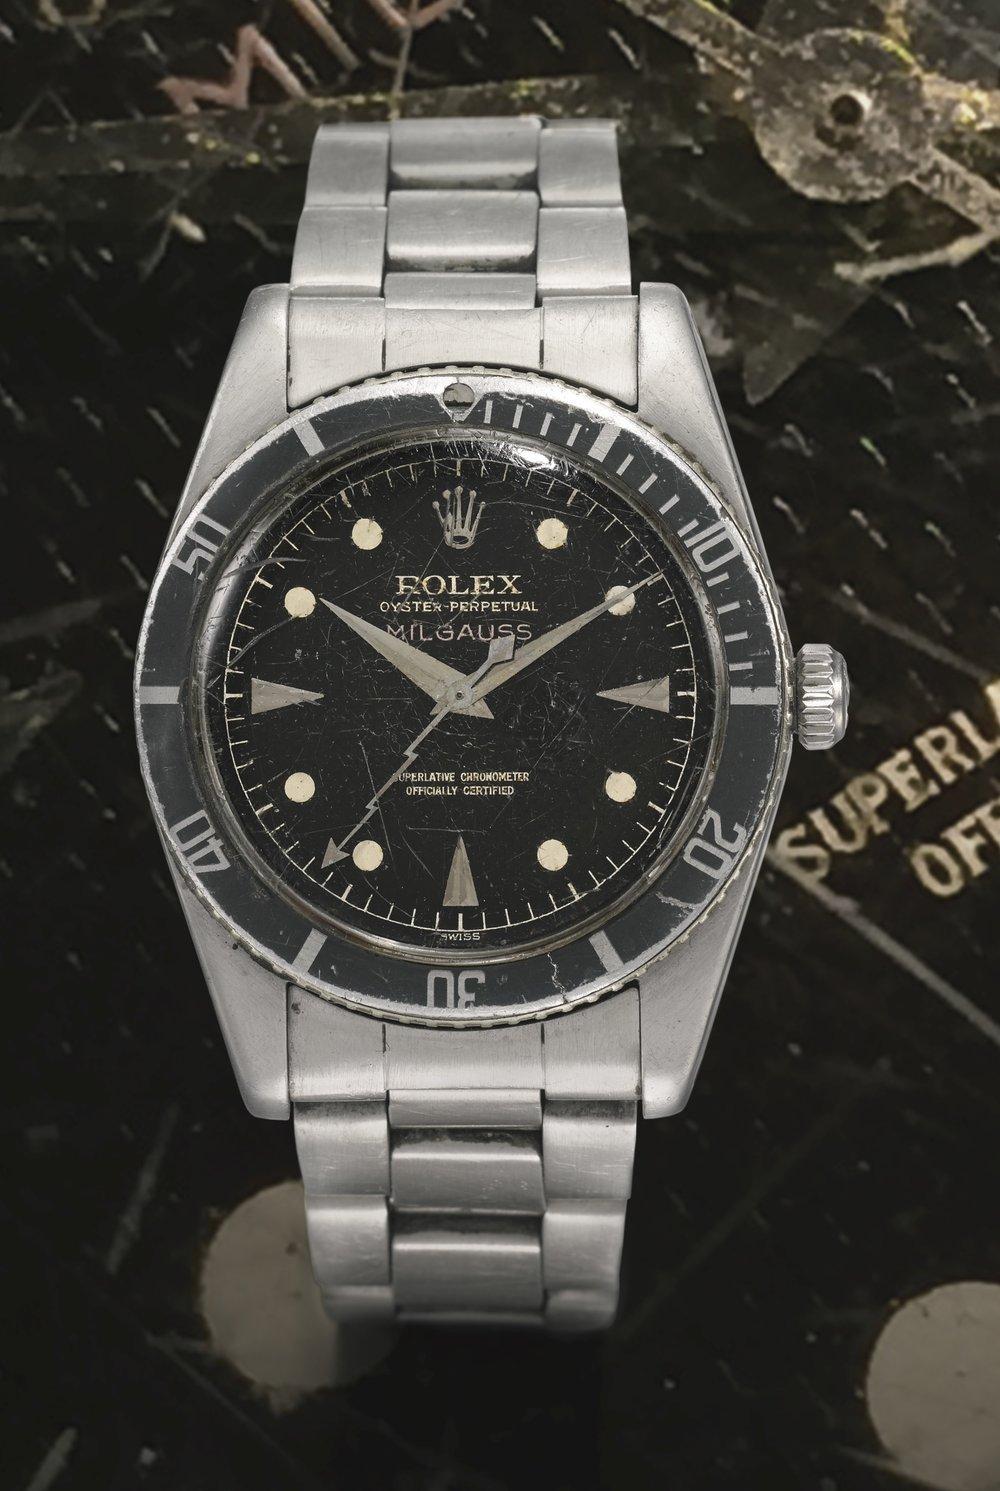 Rolex Milgauss Ref. 6541, circa 1958